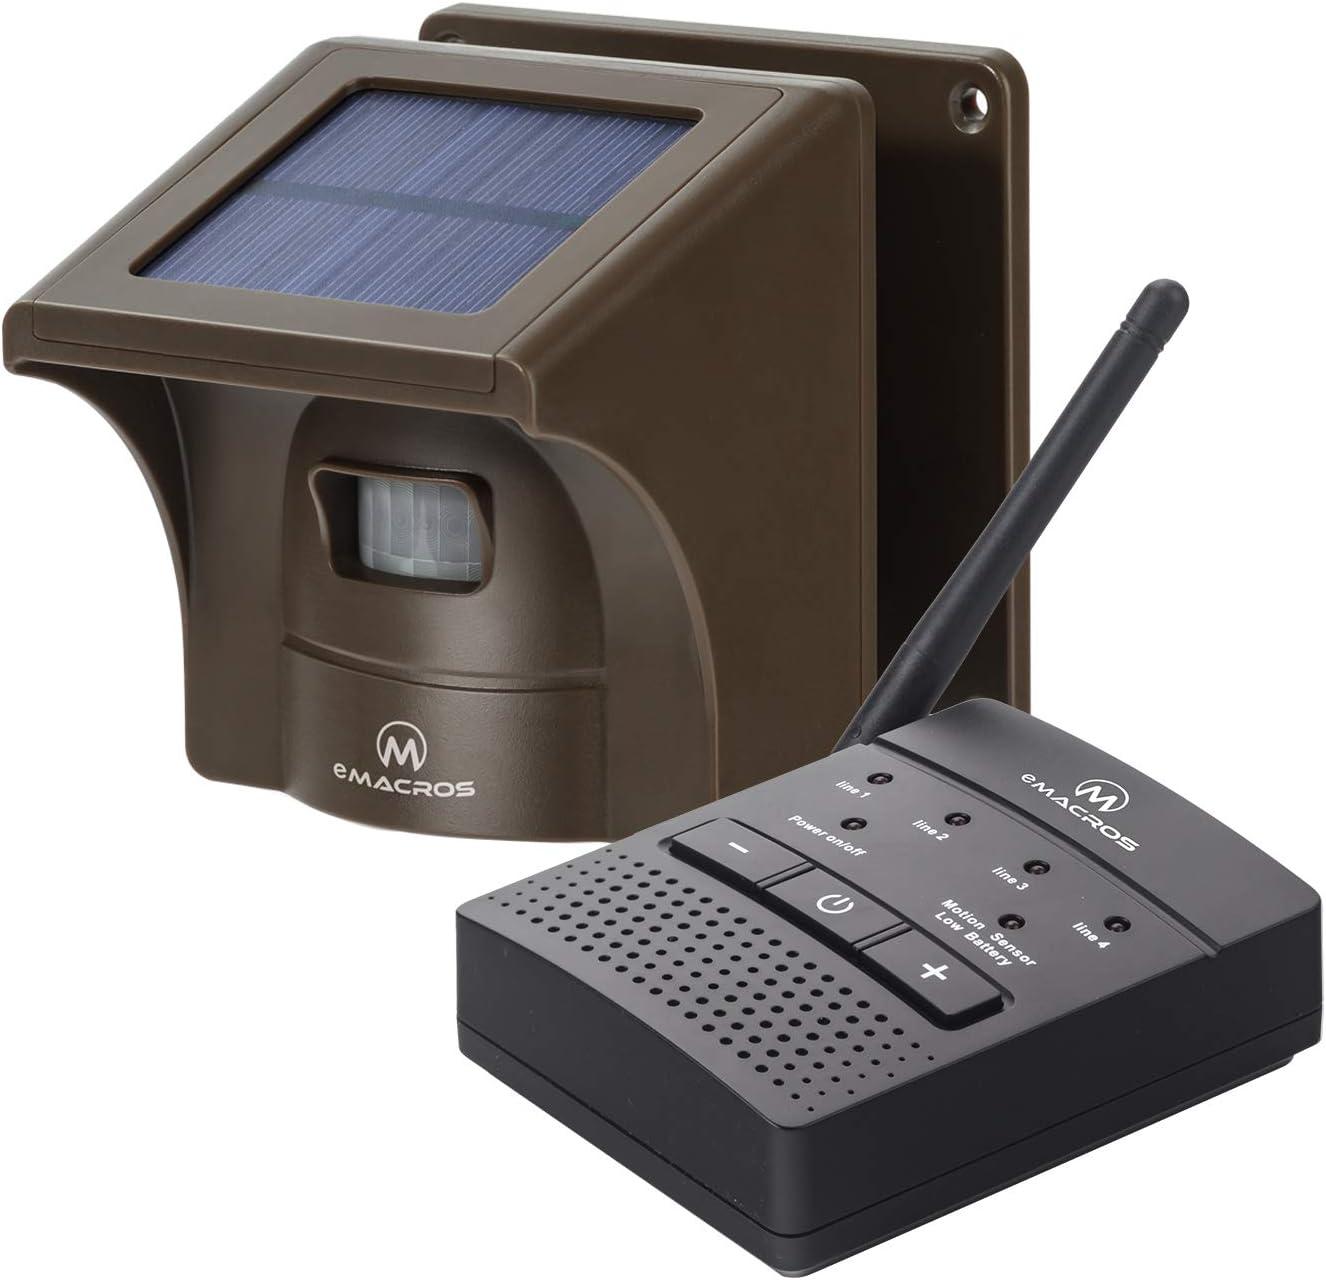 1 4 Mile Solar Driveway Alarm Sytem Wireless Long Range Outdoor Weather Resistant Motion Sensor Detector- Driveway Alarms Wireless Outside Monitor Protect